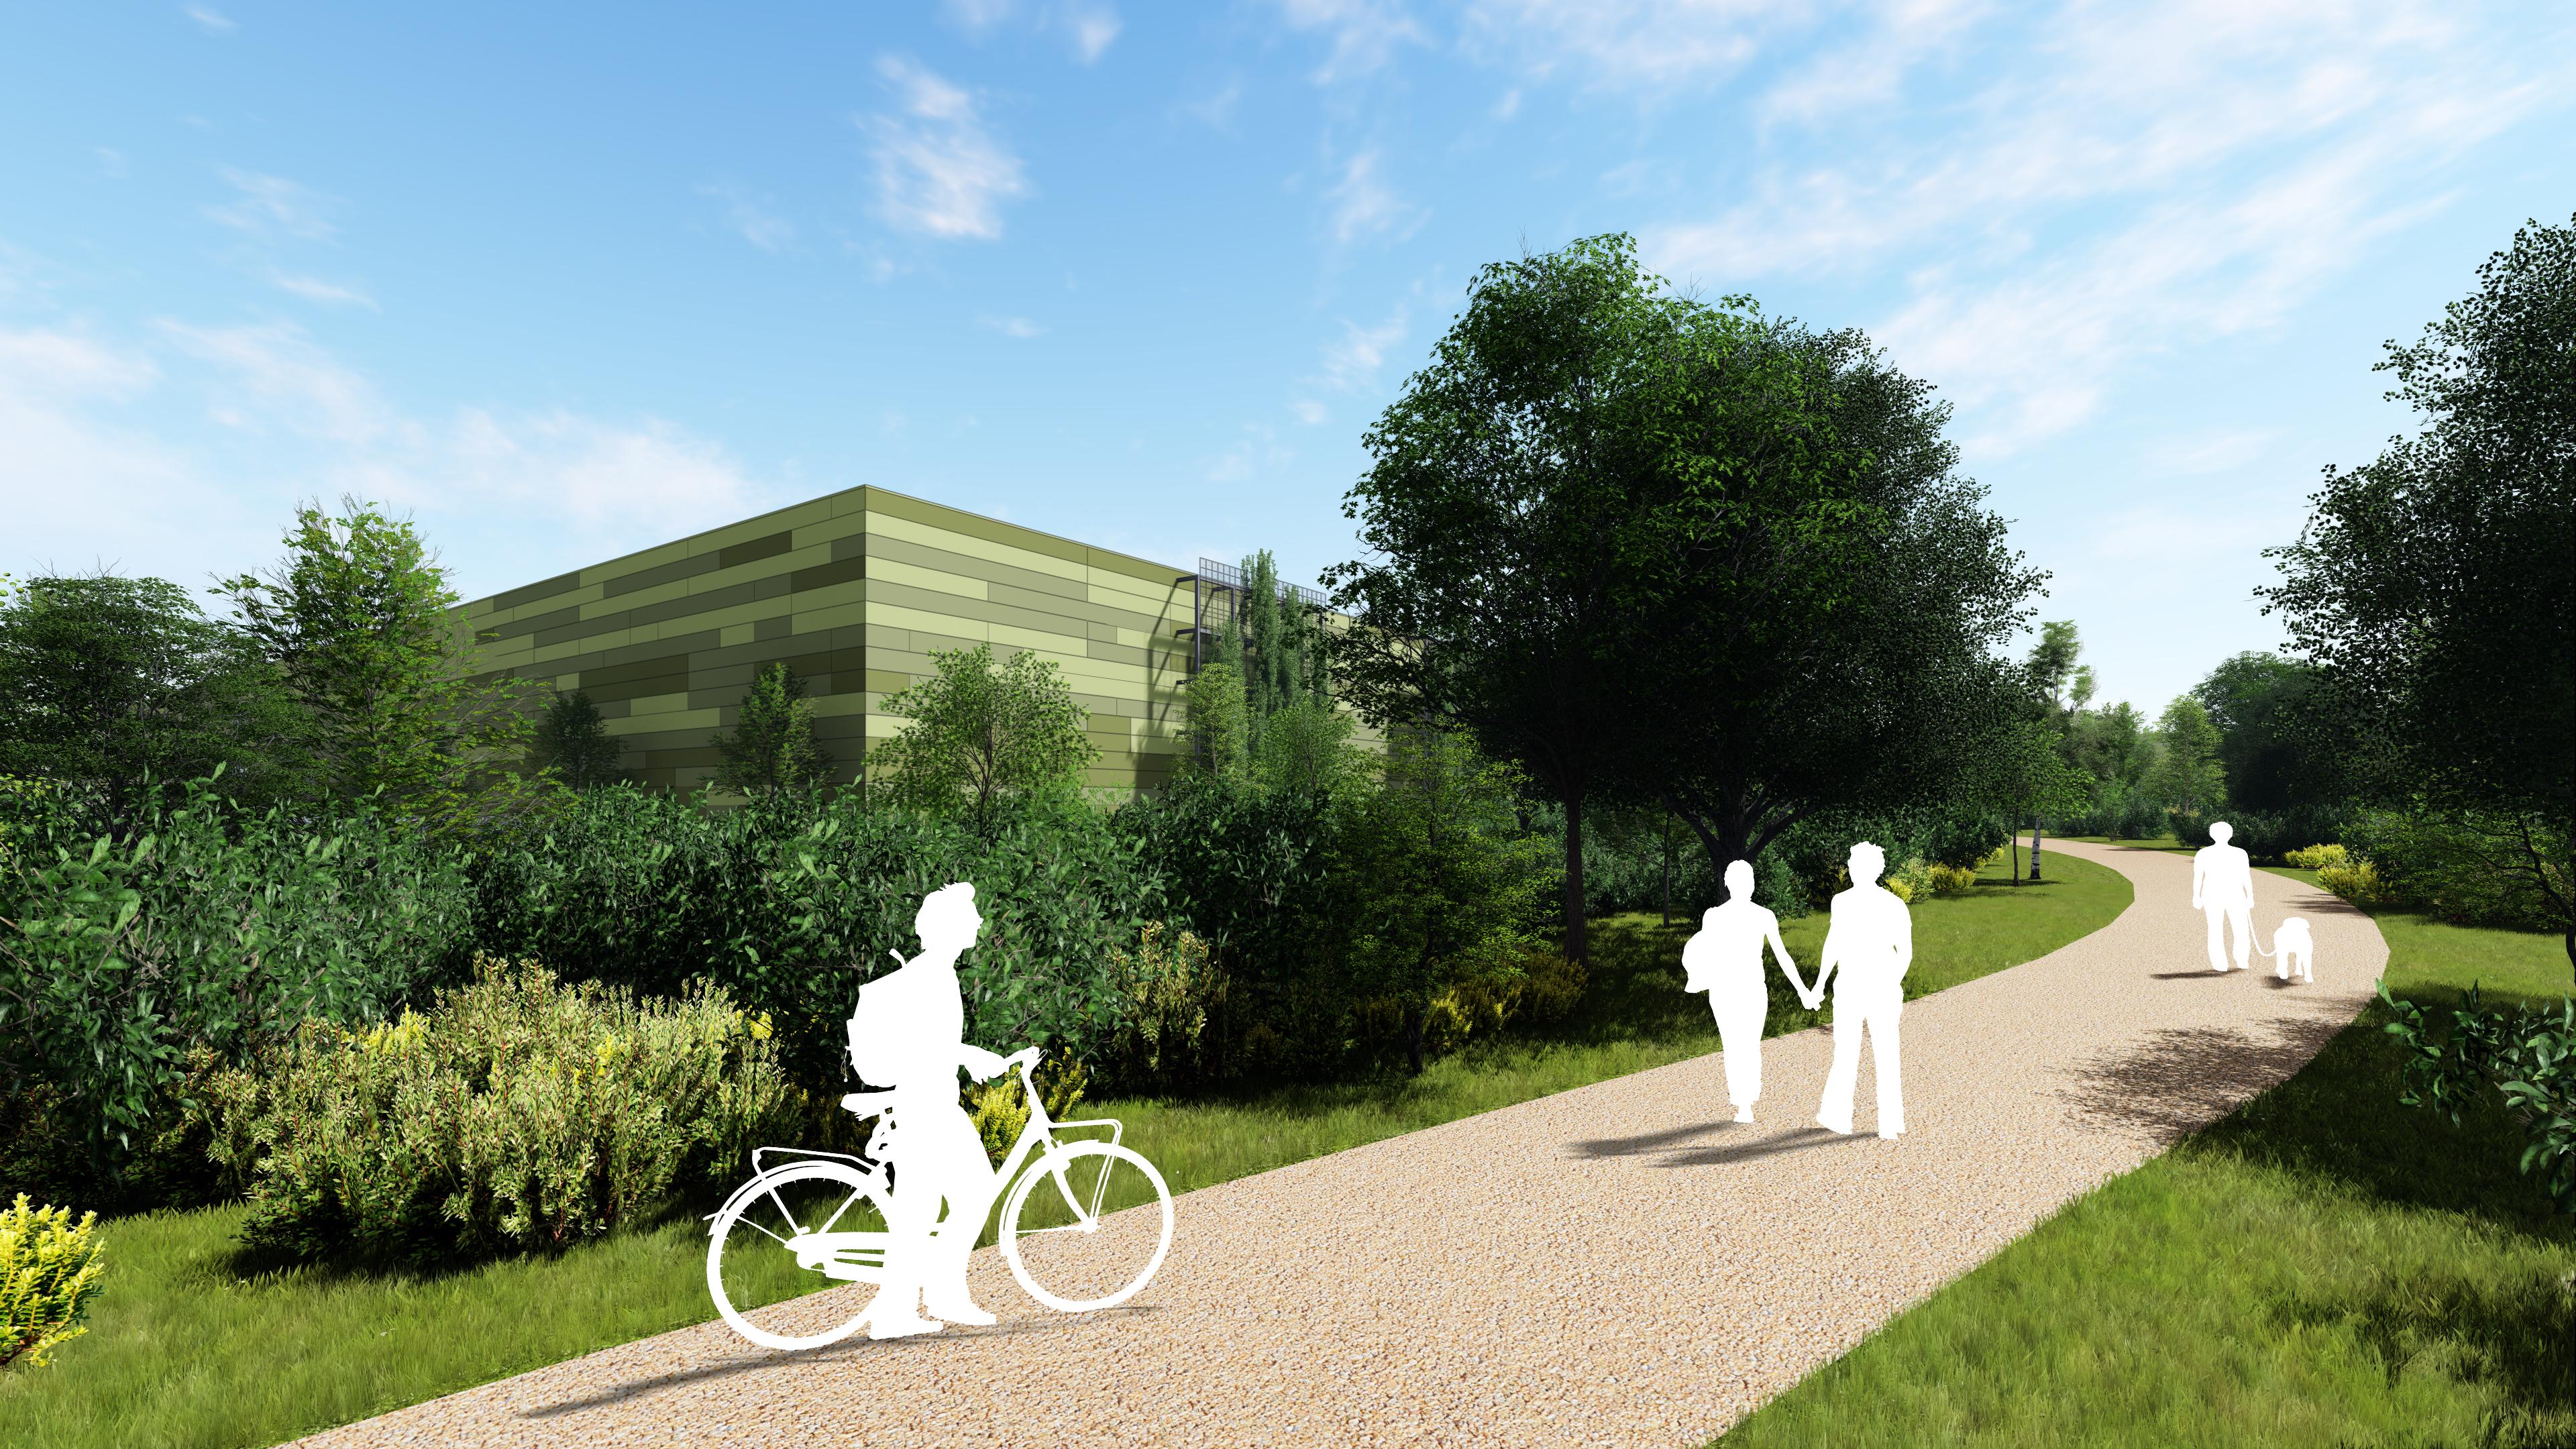 Swindon Science Park